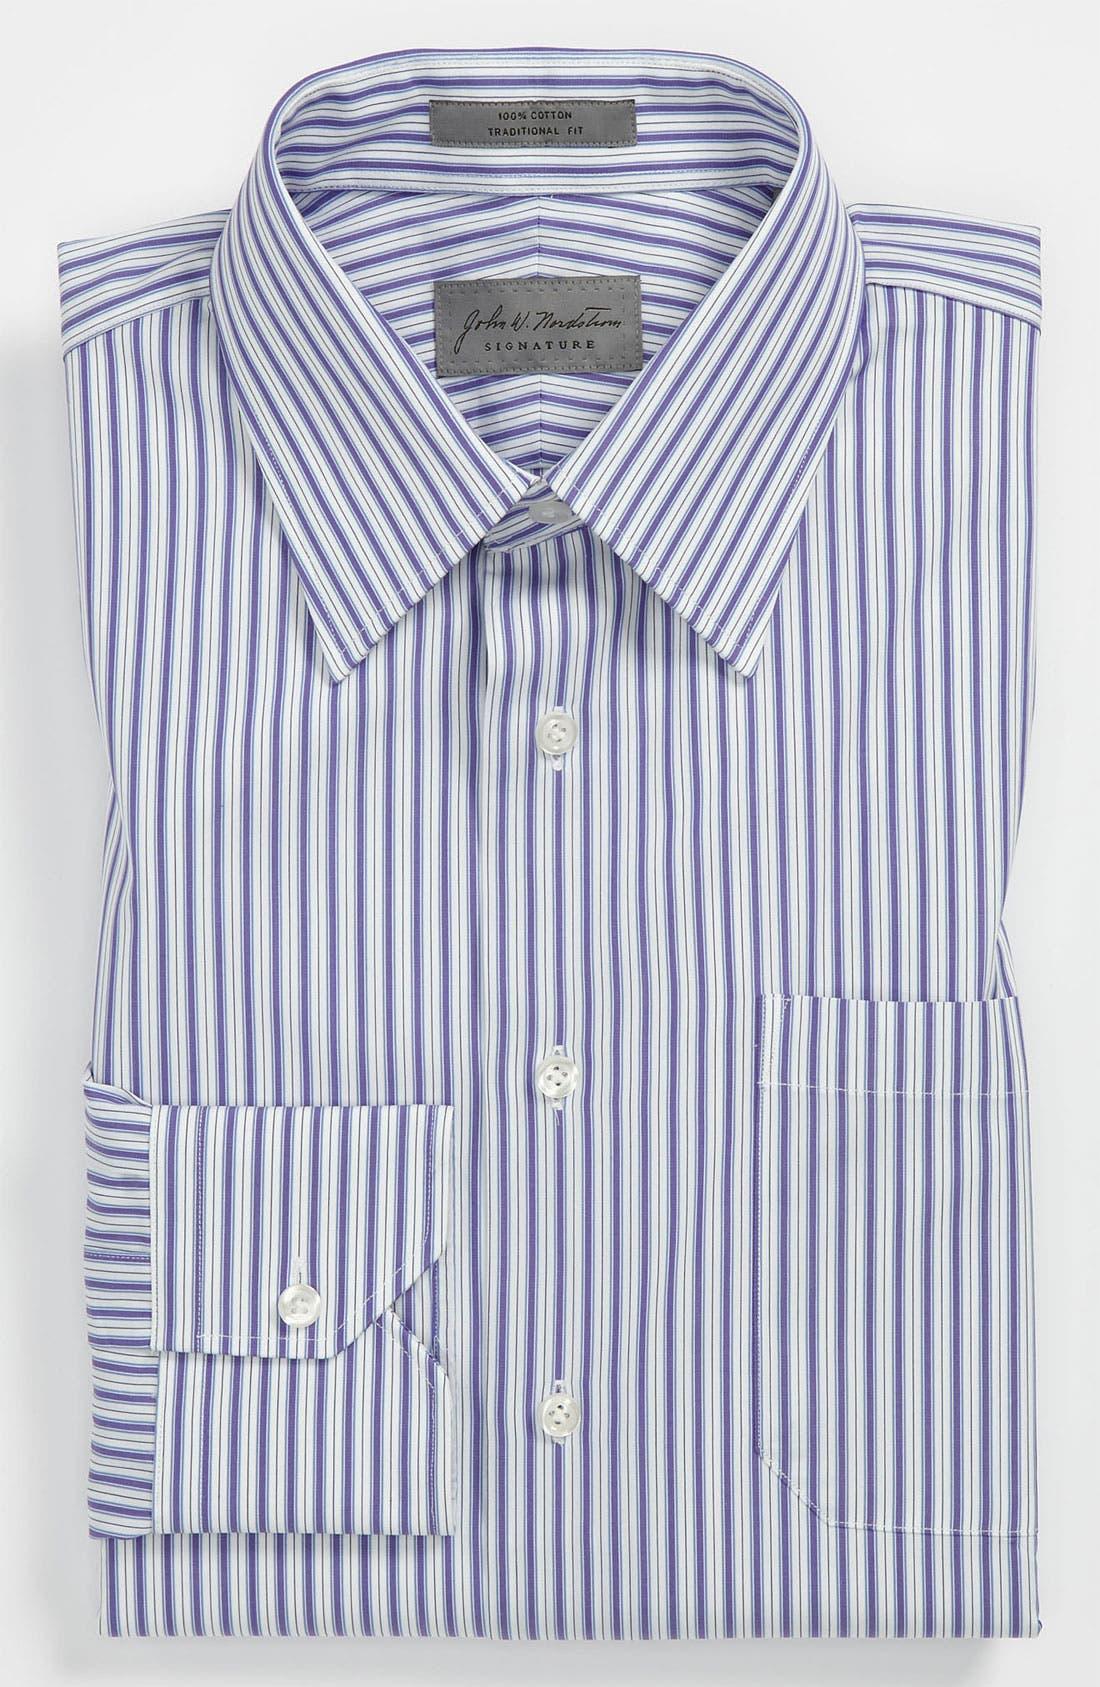 Main Image - John W. Nordstrom Traditional Fit Dress Shirt